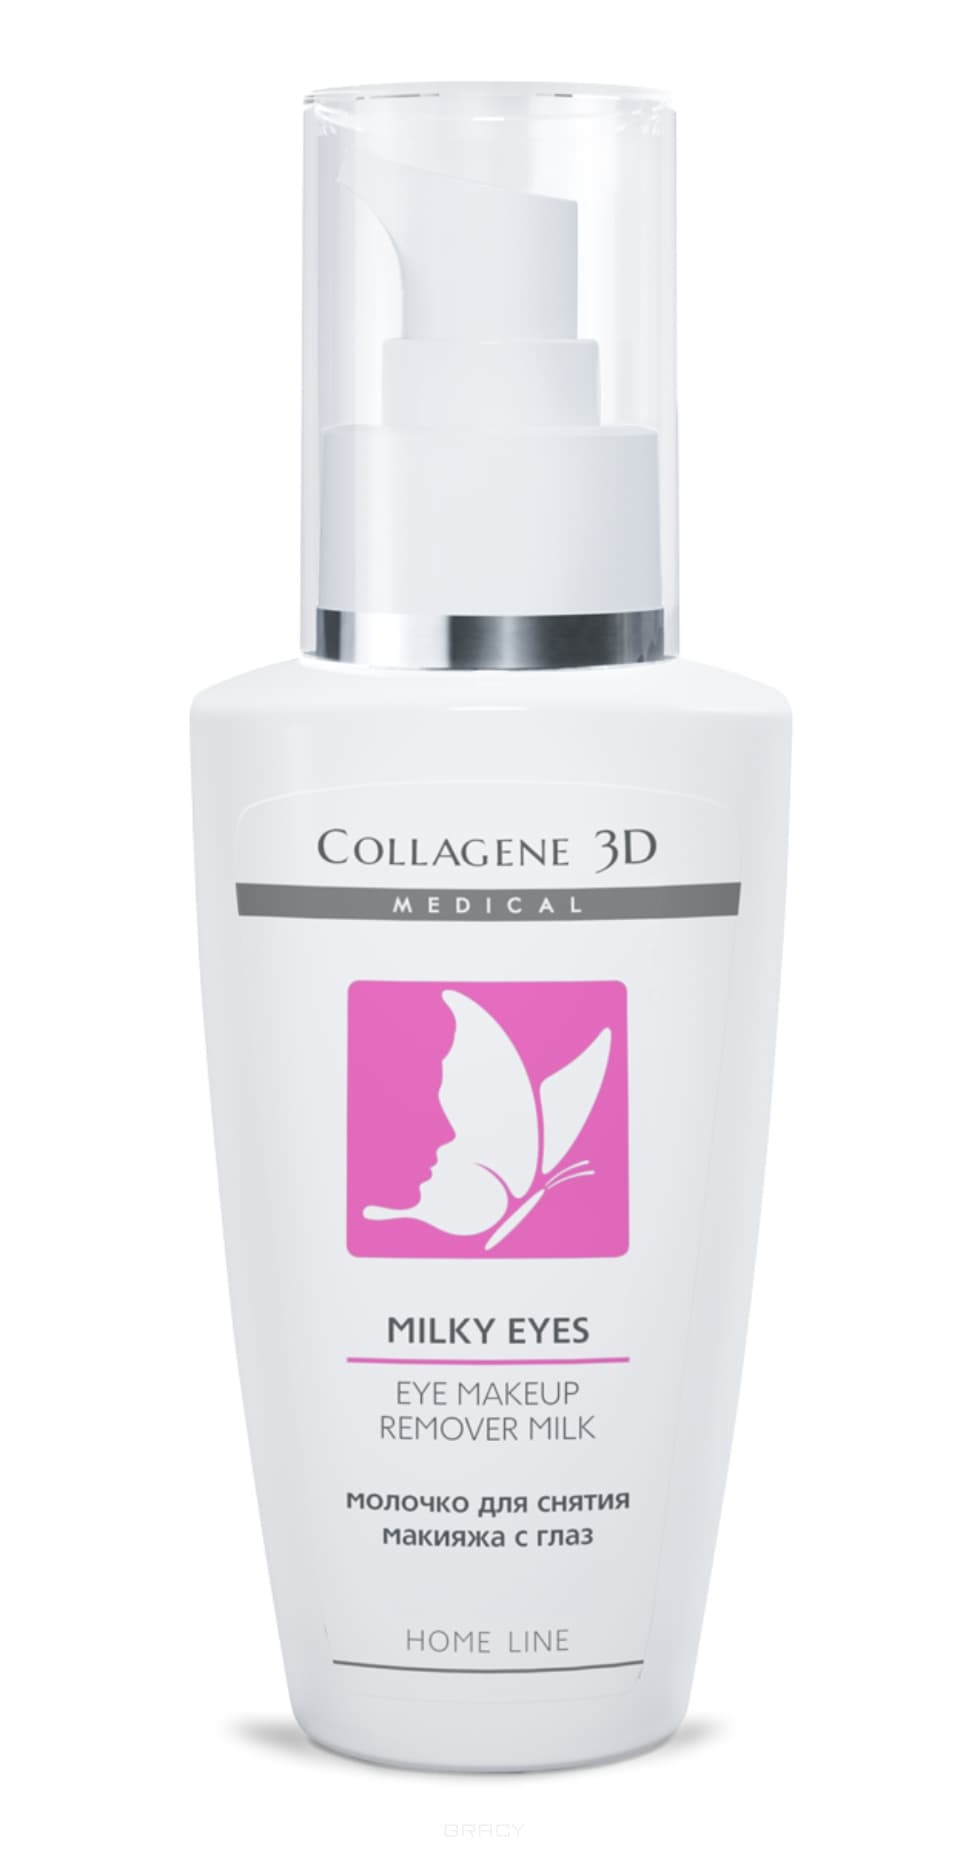 Collagene 3D Молочко для глаз Milky Eyes очищающее, 125 мл, Молочко для глаз Milky Eyes очищающее, 125 мл, 125 мл  недорого